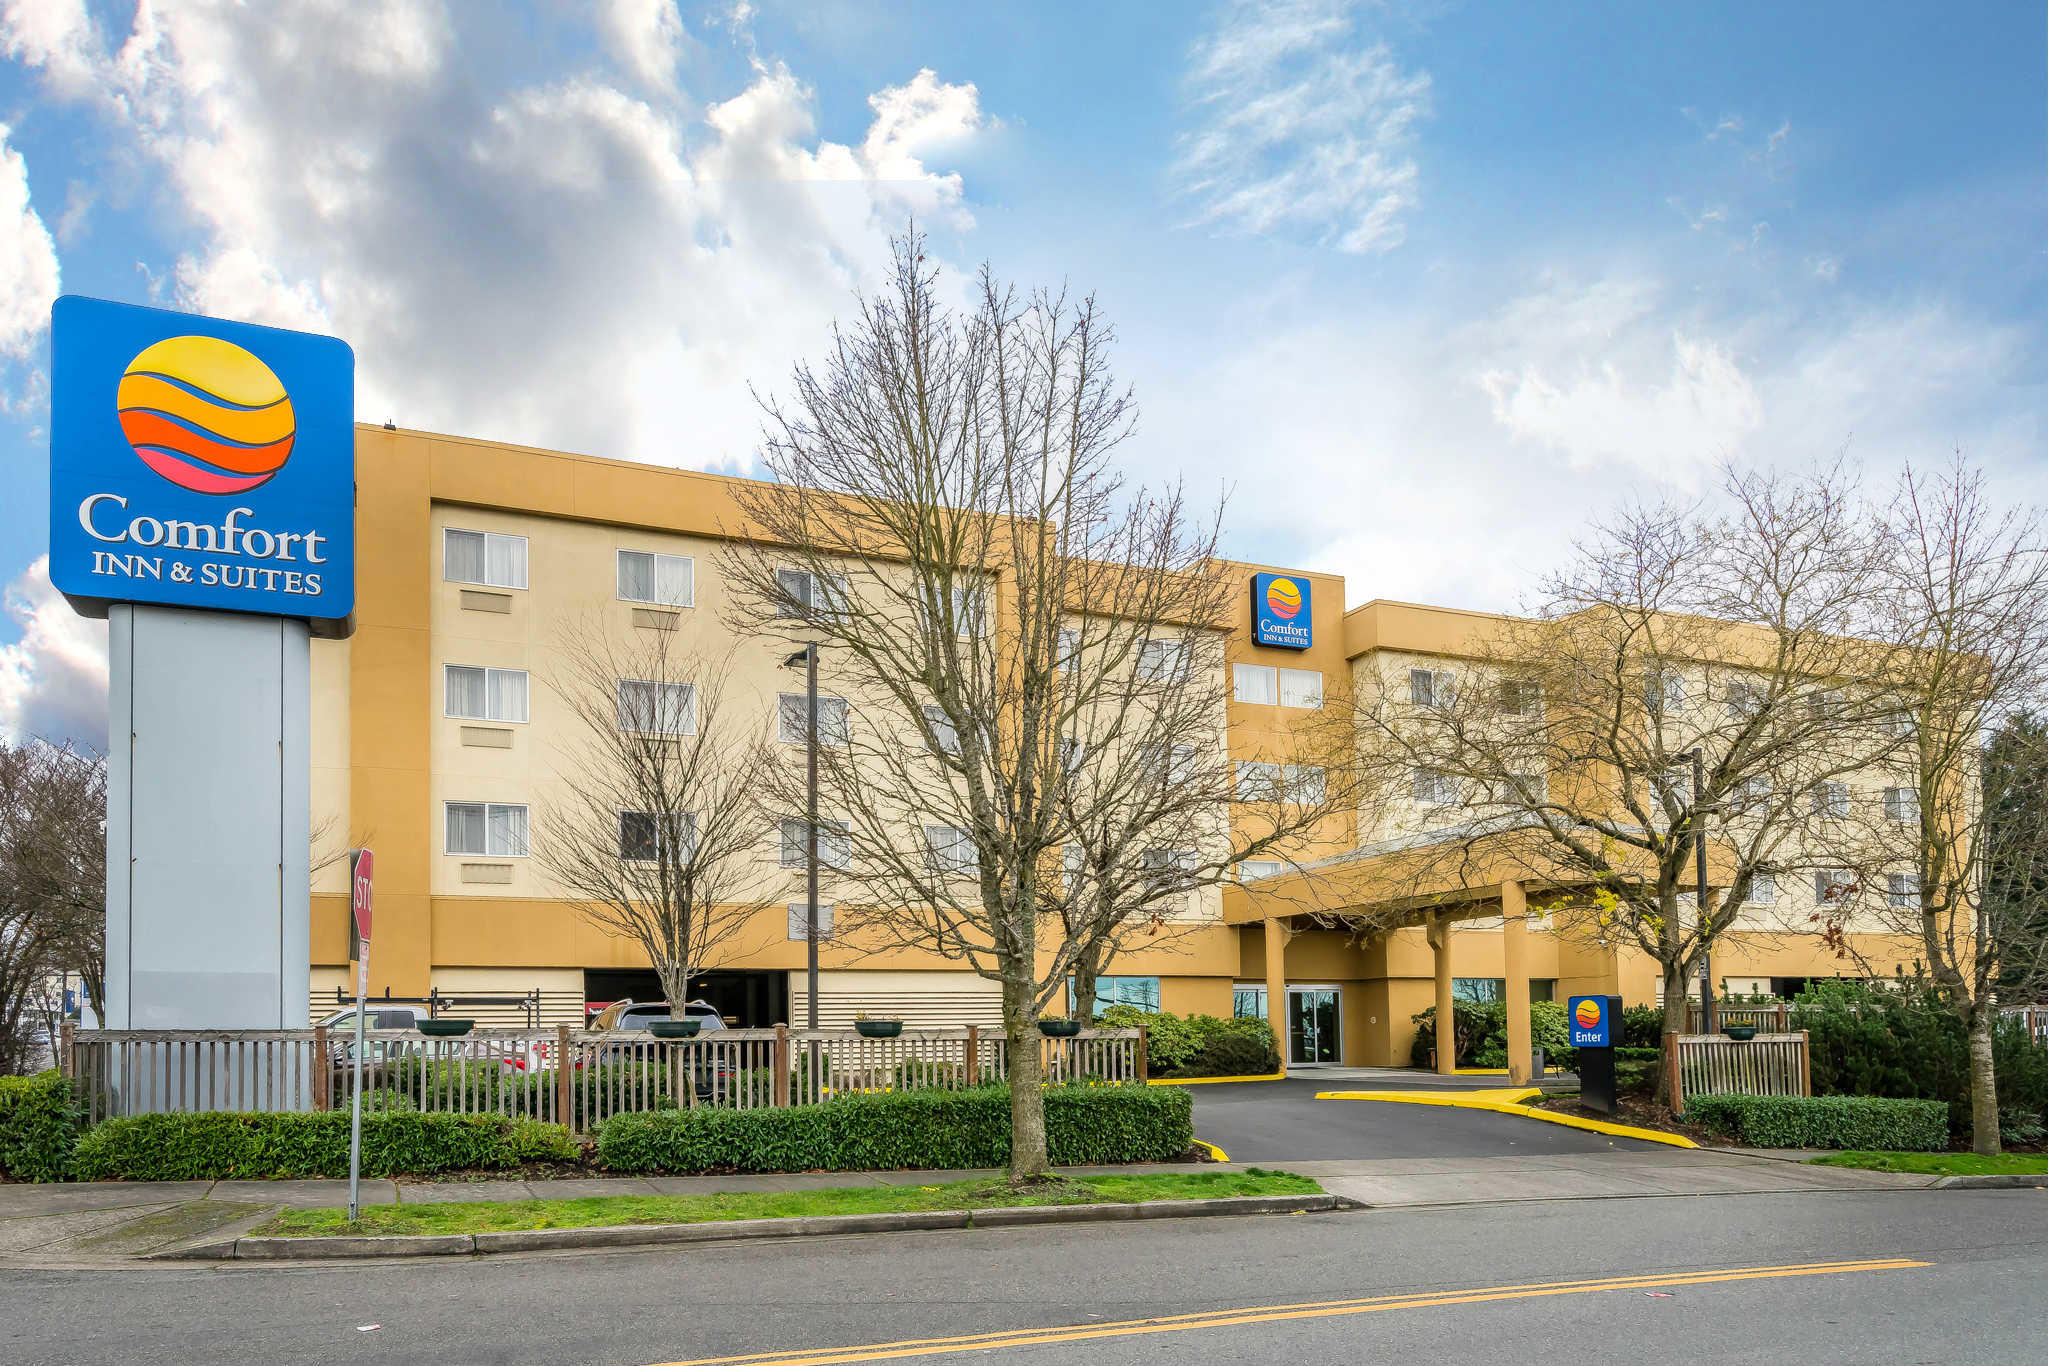 Shoreline Wa Hotels And Motels